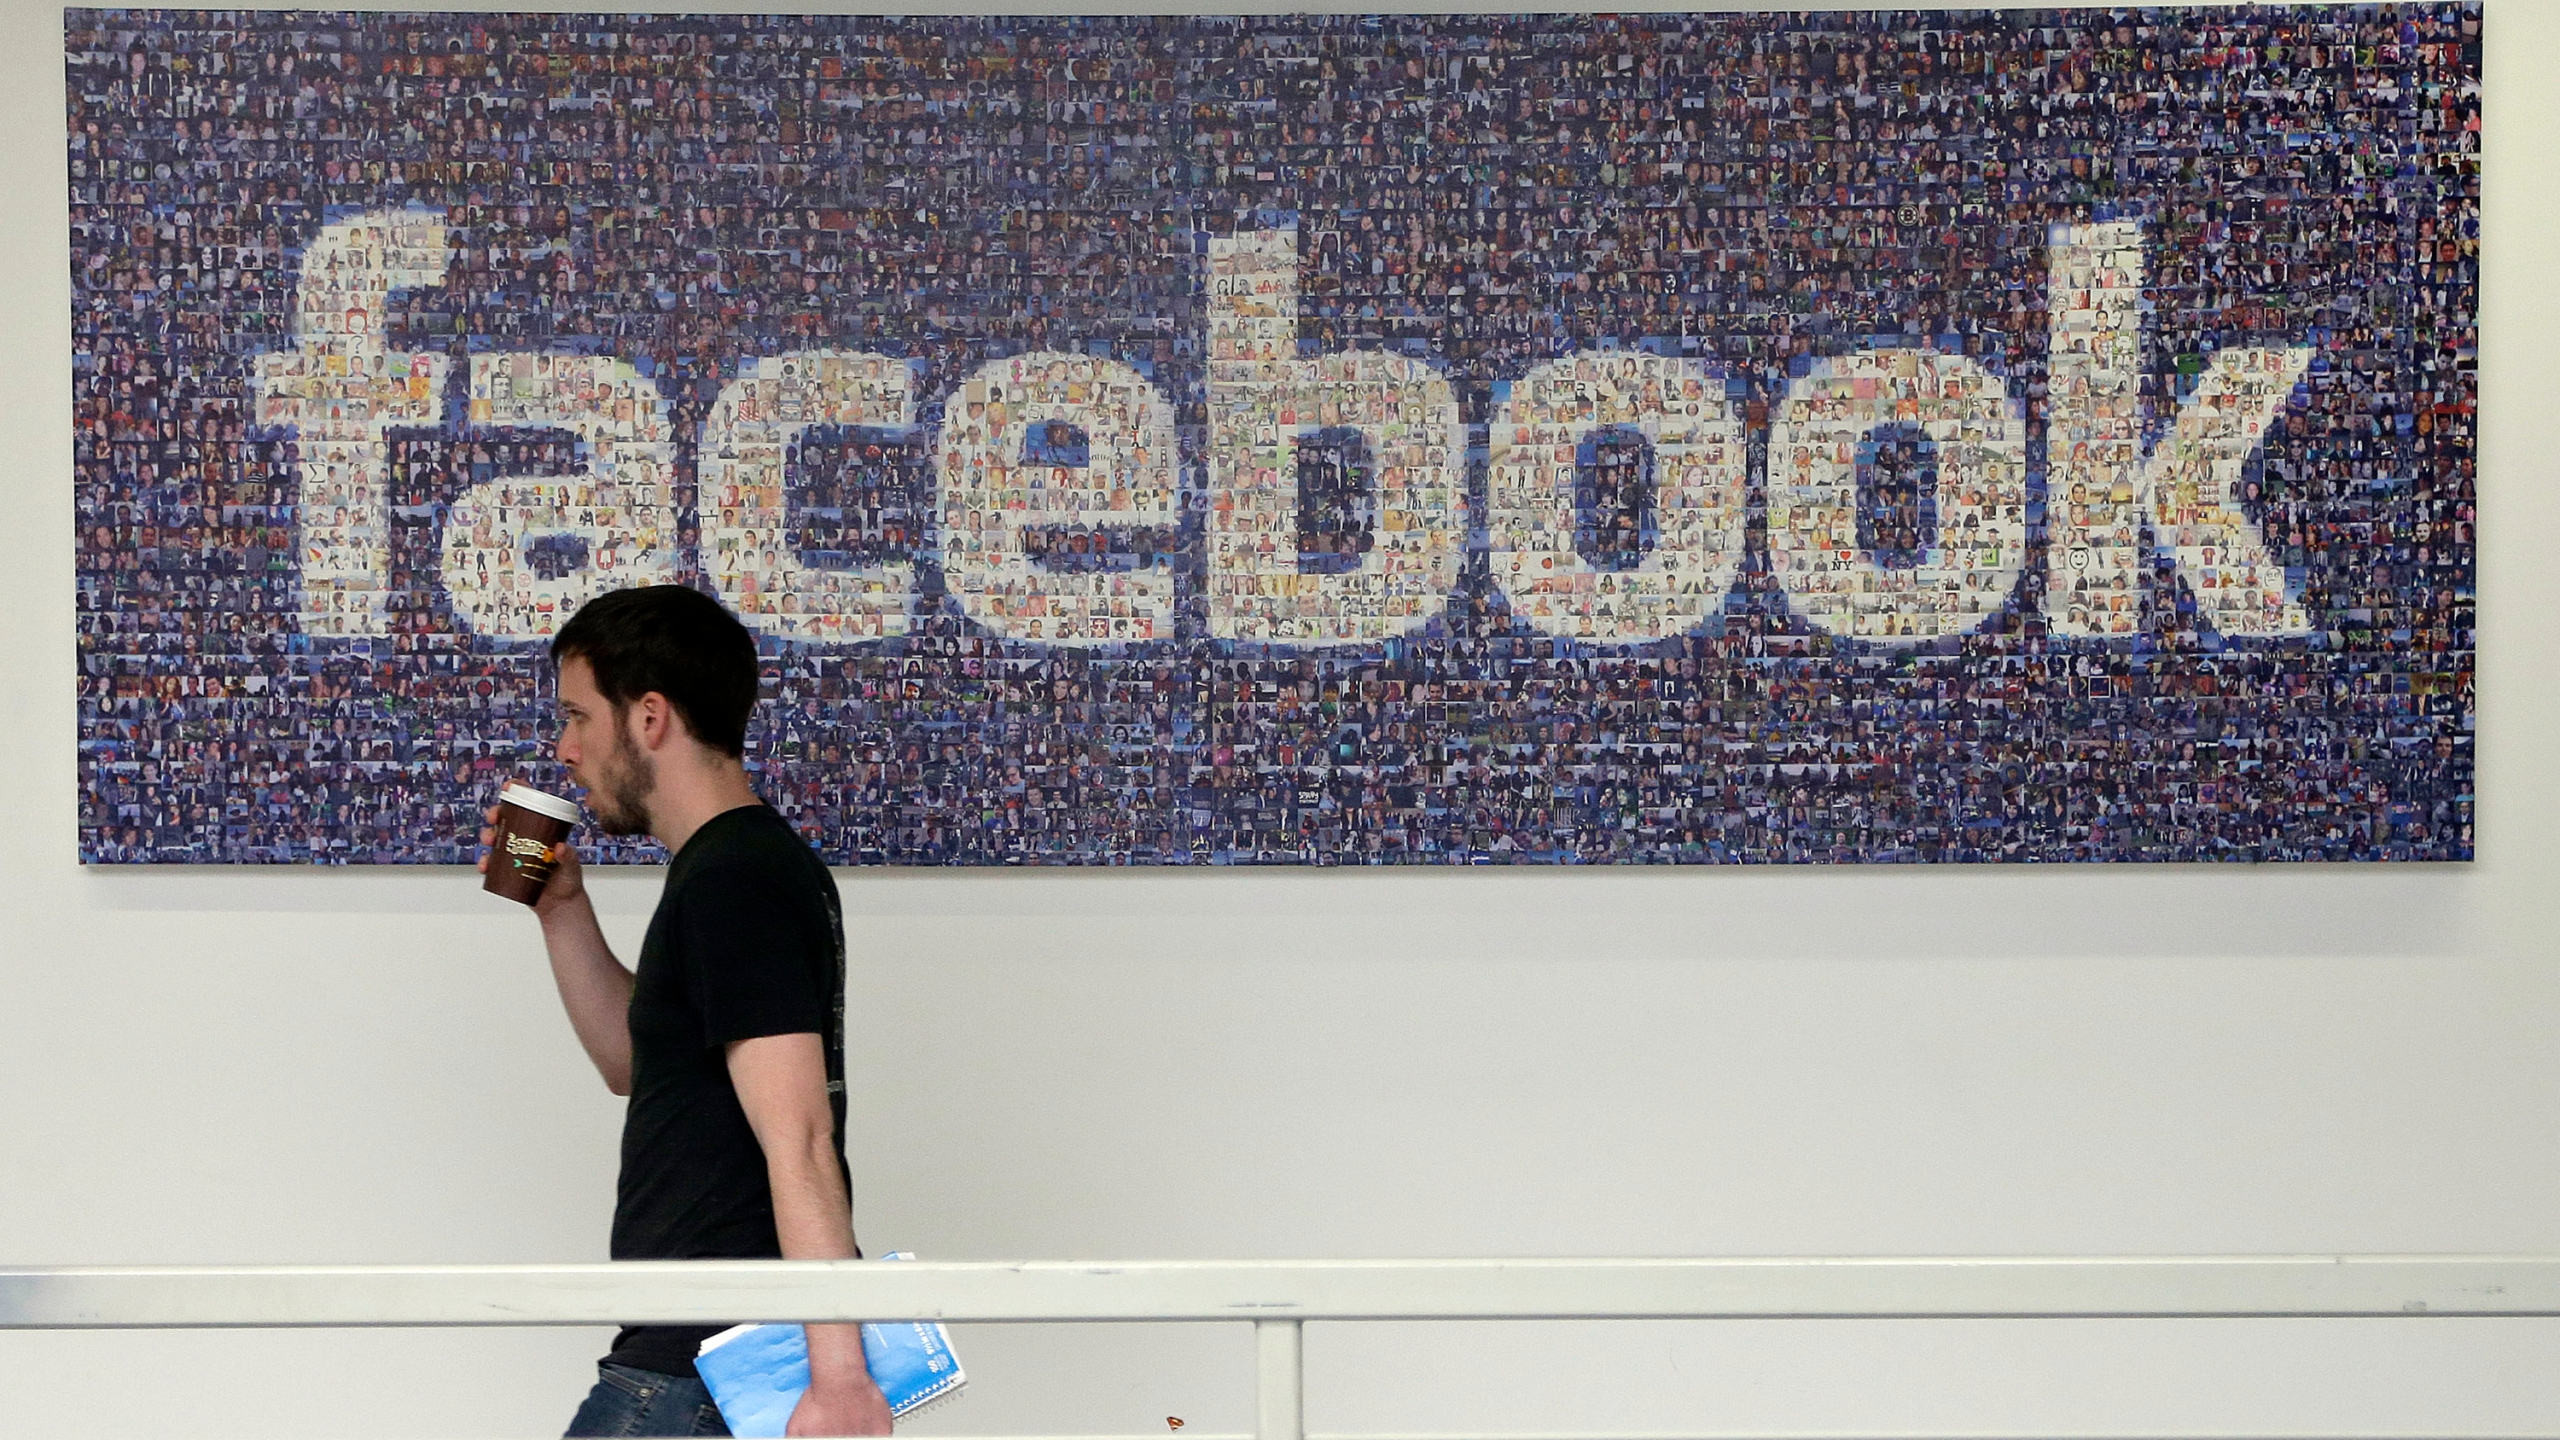 Facebook_Expansion_02265-159532.jpg02845575